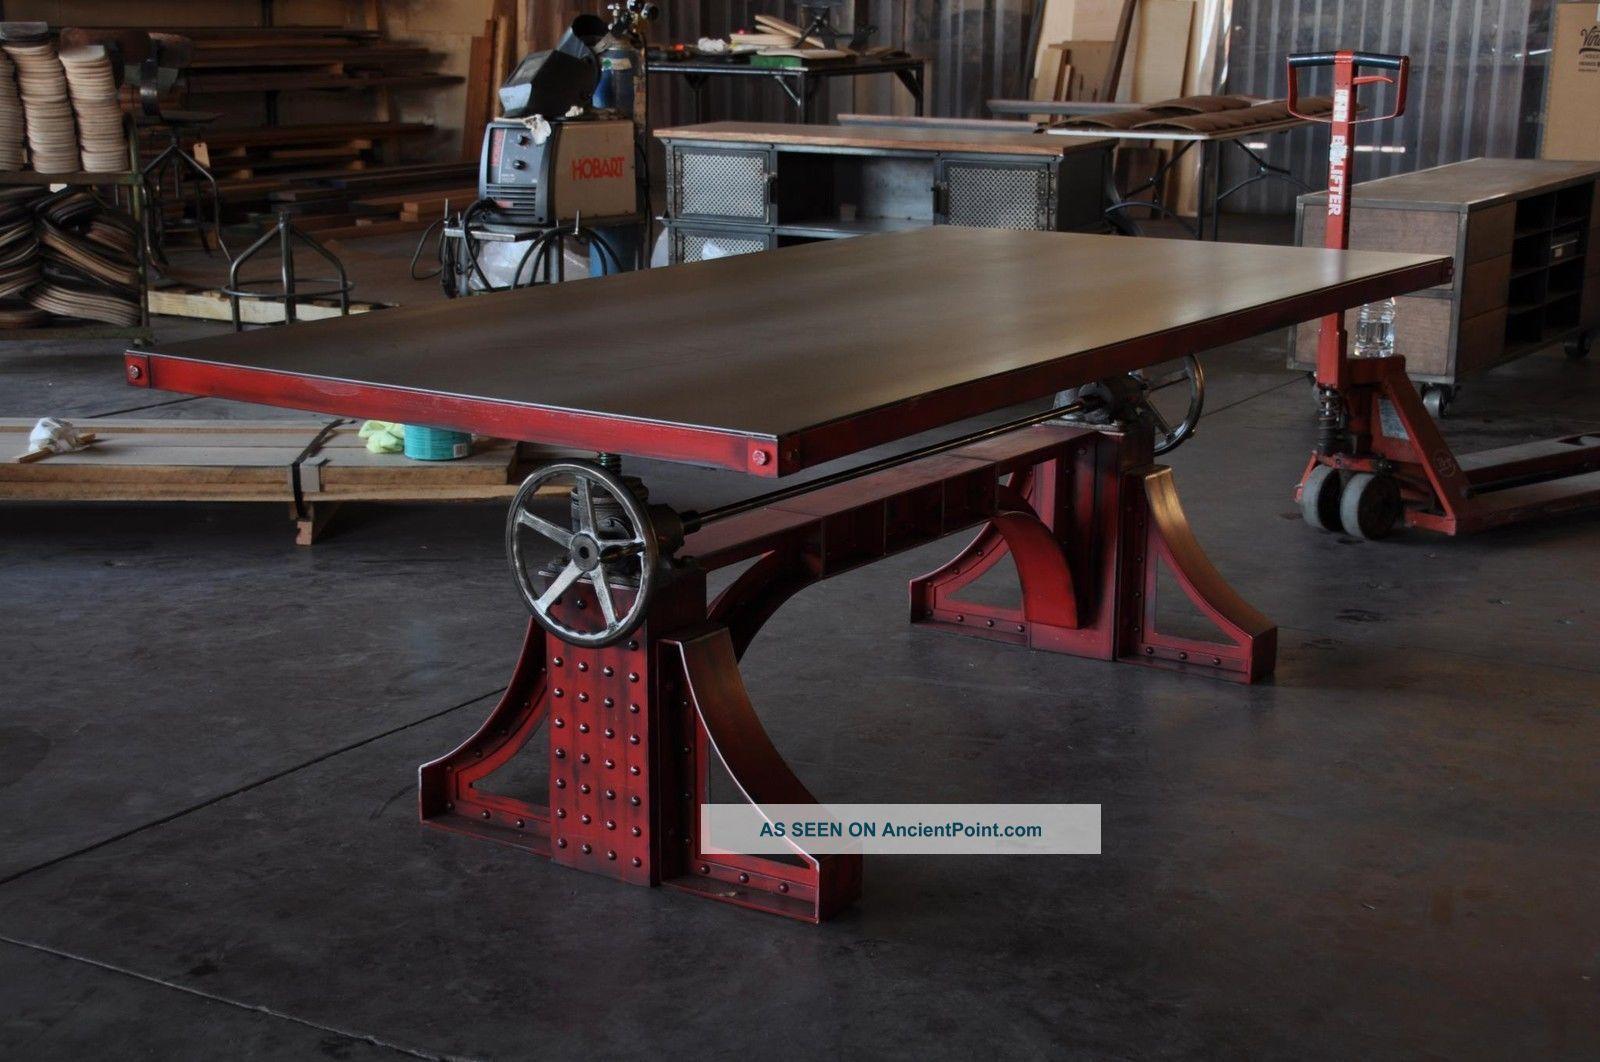 Vintage Industrial Bronx Adjustable Height Table / Desk